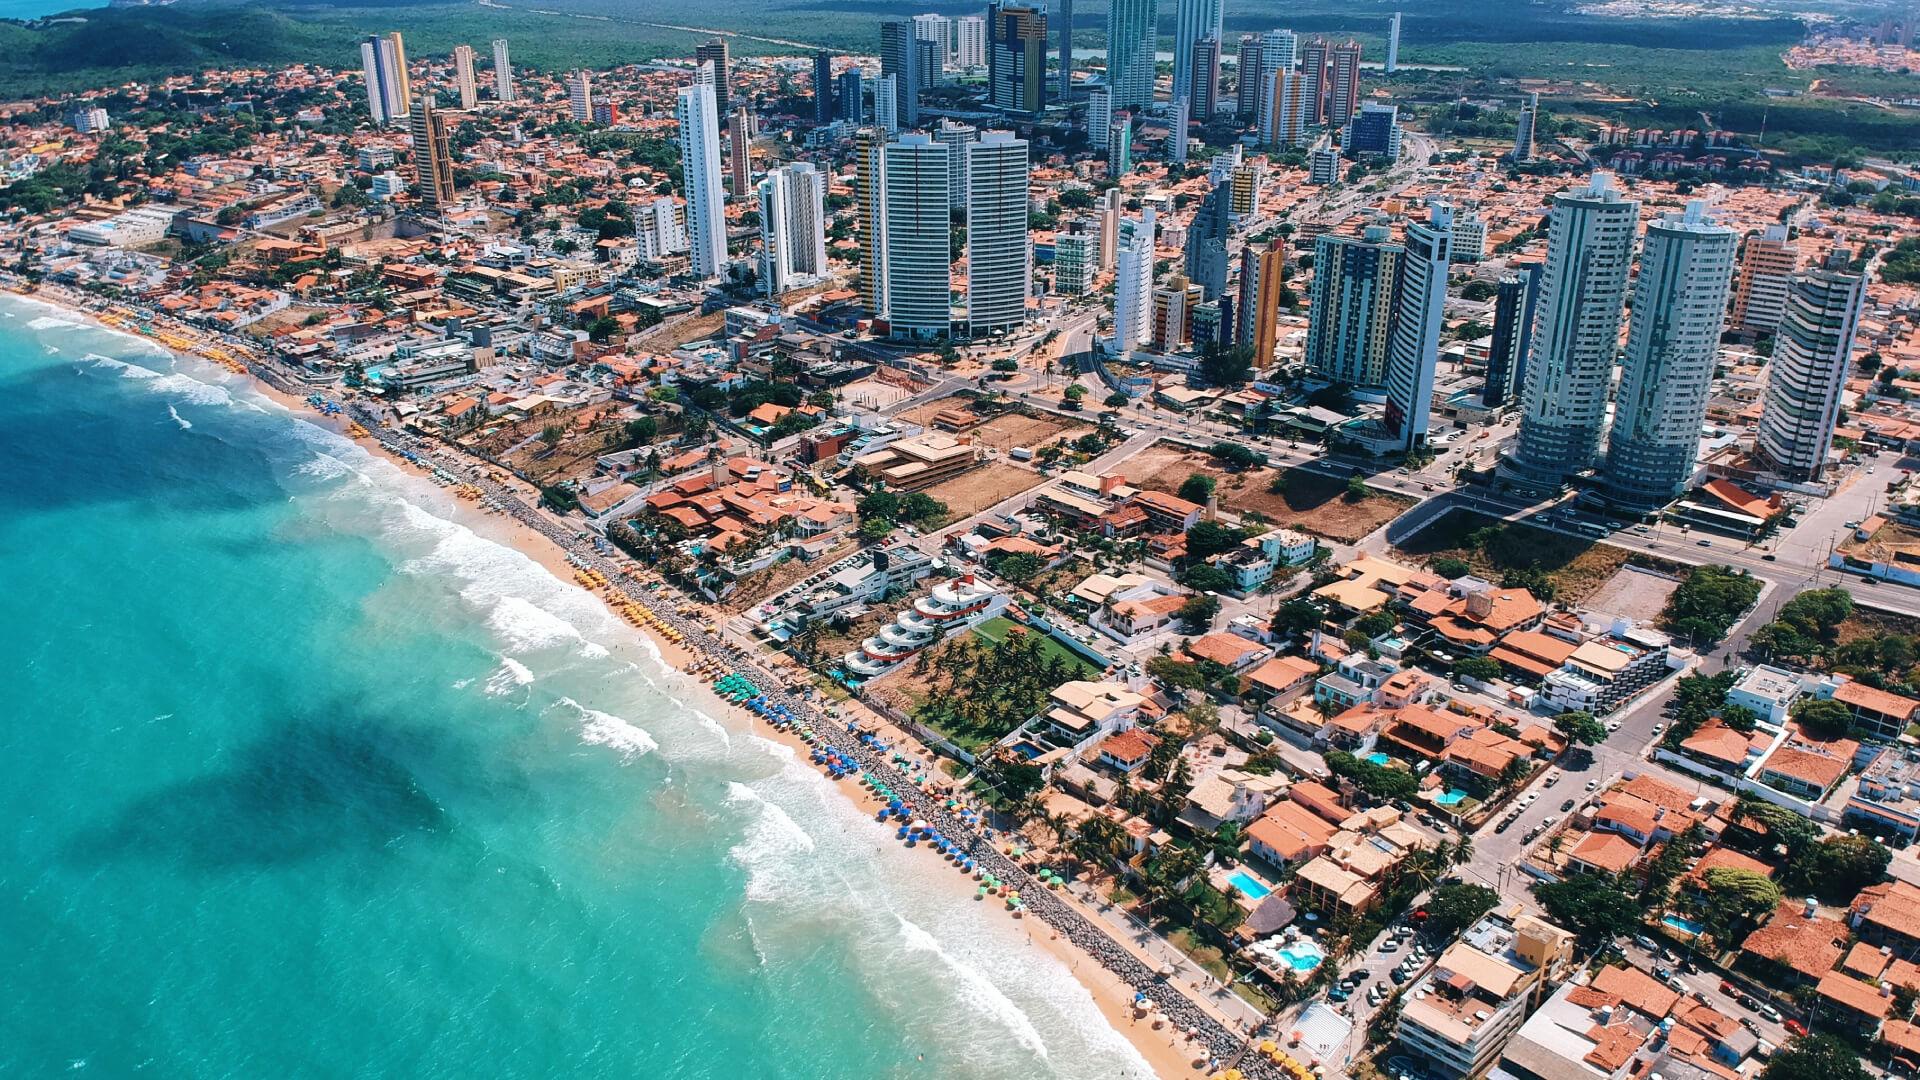 E-invoice-Data-Reveals-the-Impact-of-COVID-19-on-Brazil's-Economy